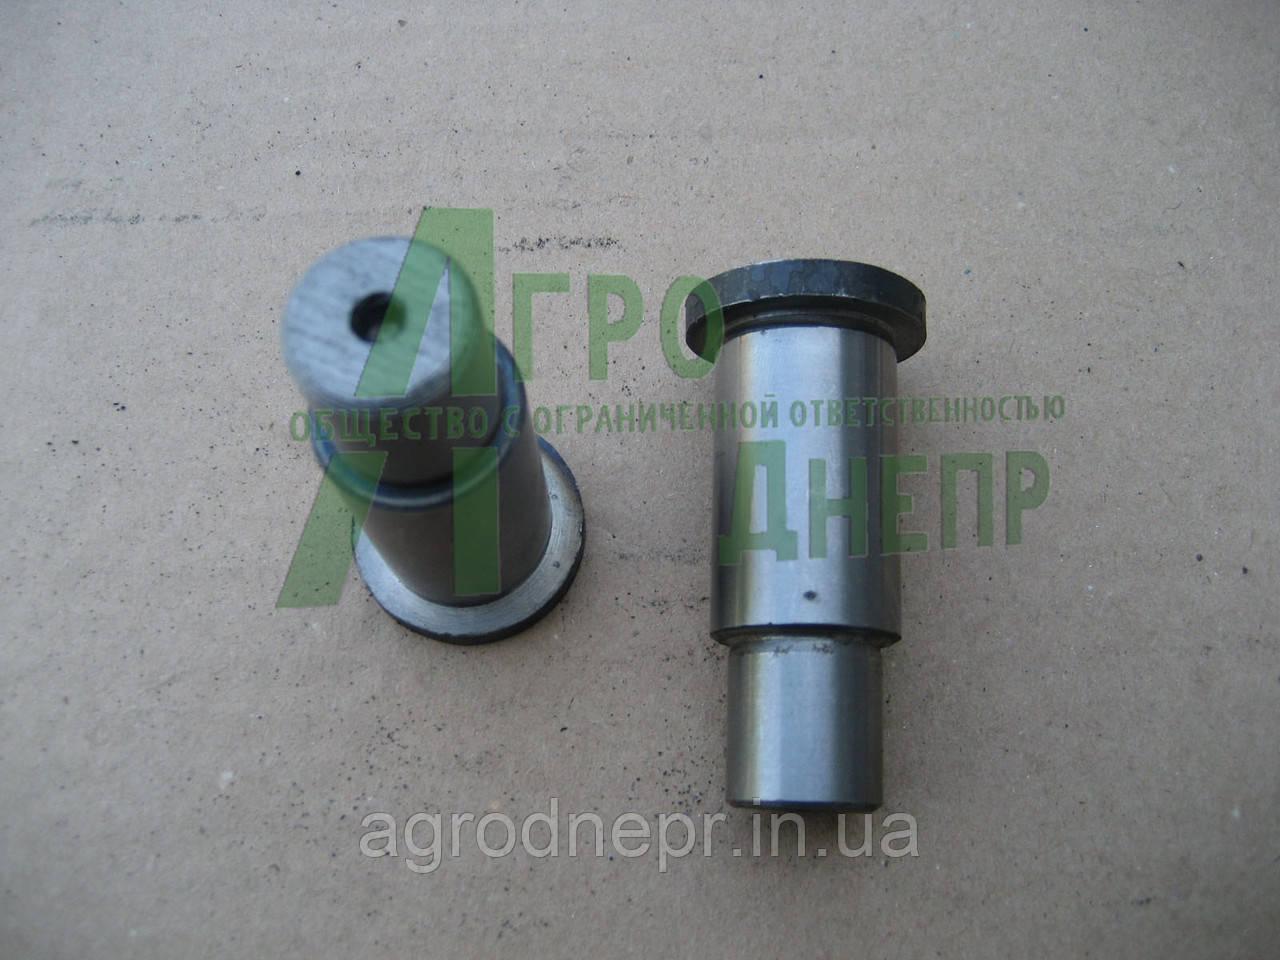 Валик привода масляного насоса Д-65 Д08-023 ЮМЗ